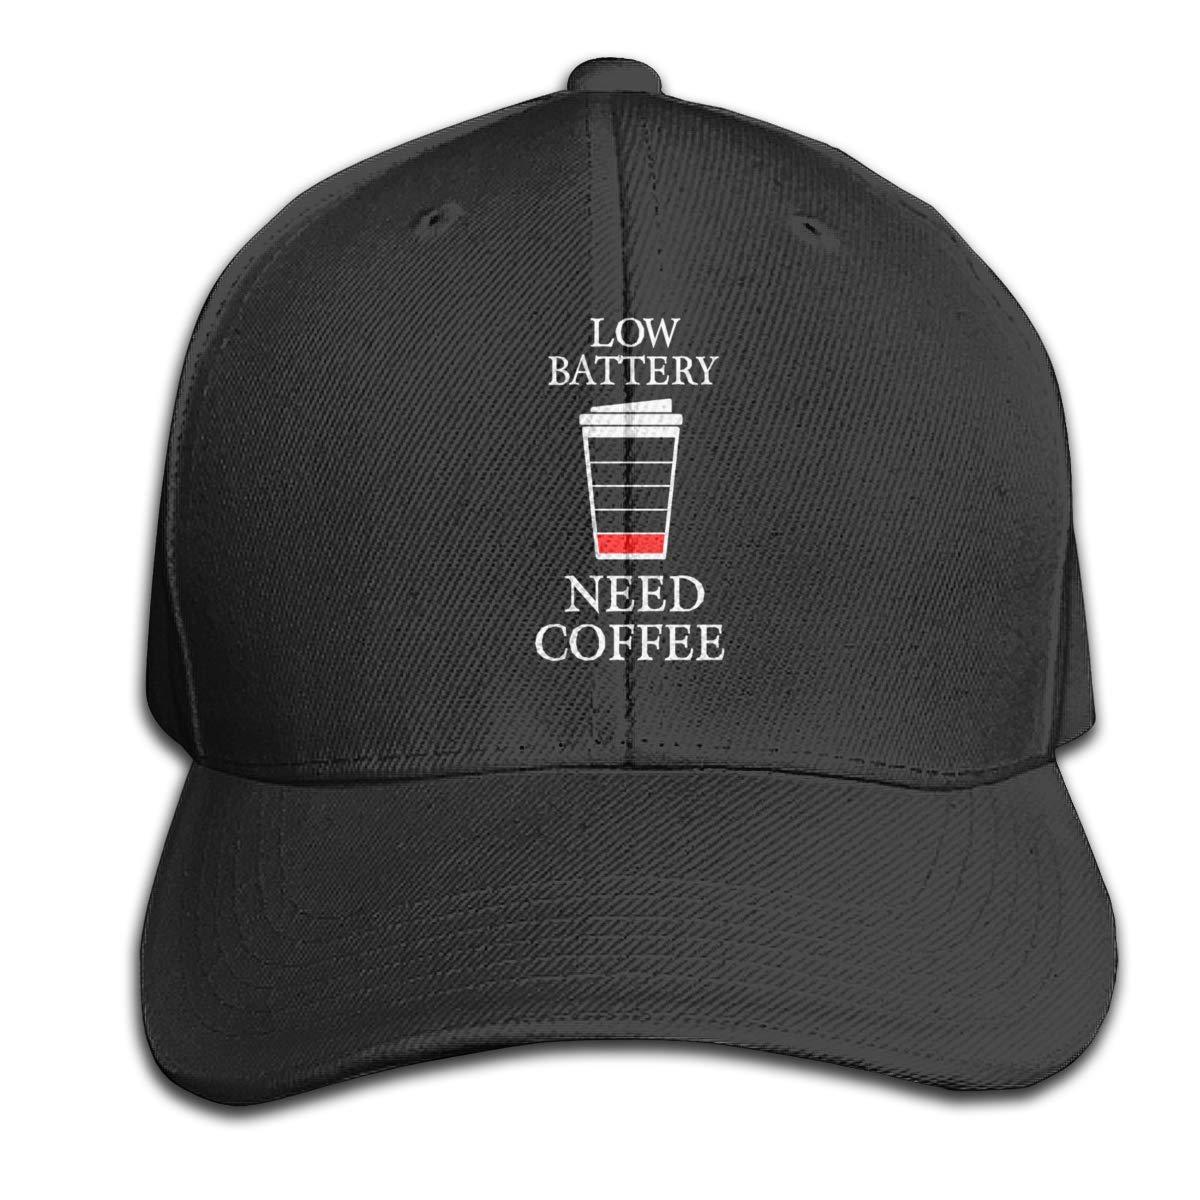 Low Battery Need Coffee Pure Color Peaked Hats Trucker Hats Fits Men Women